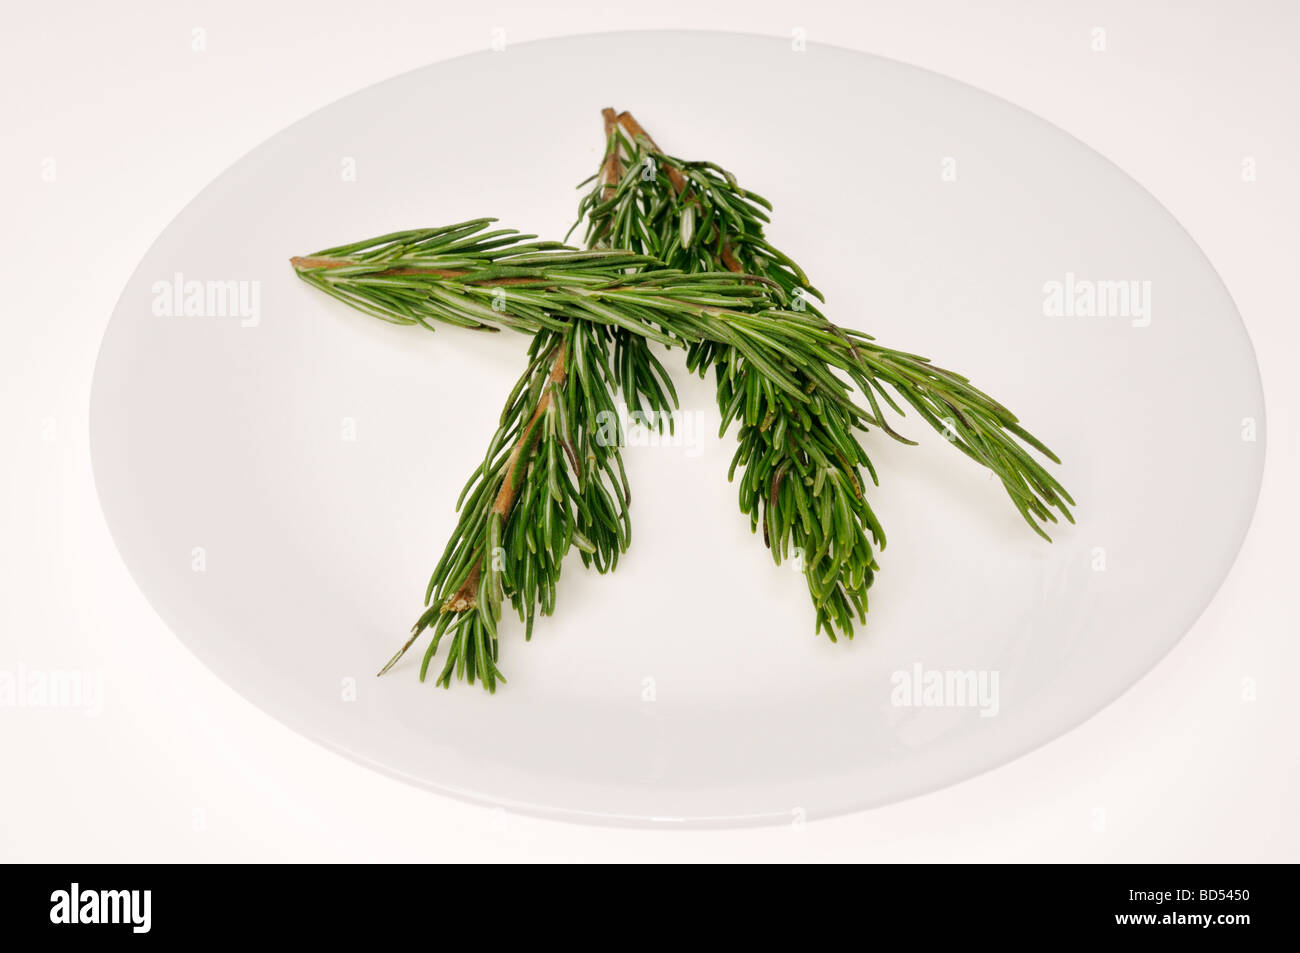 Fresh cut Rosemary sprigs on white plate - Stock Image